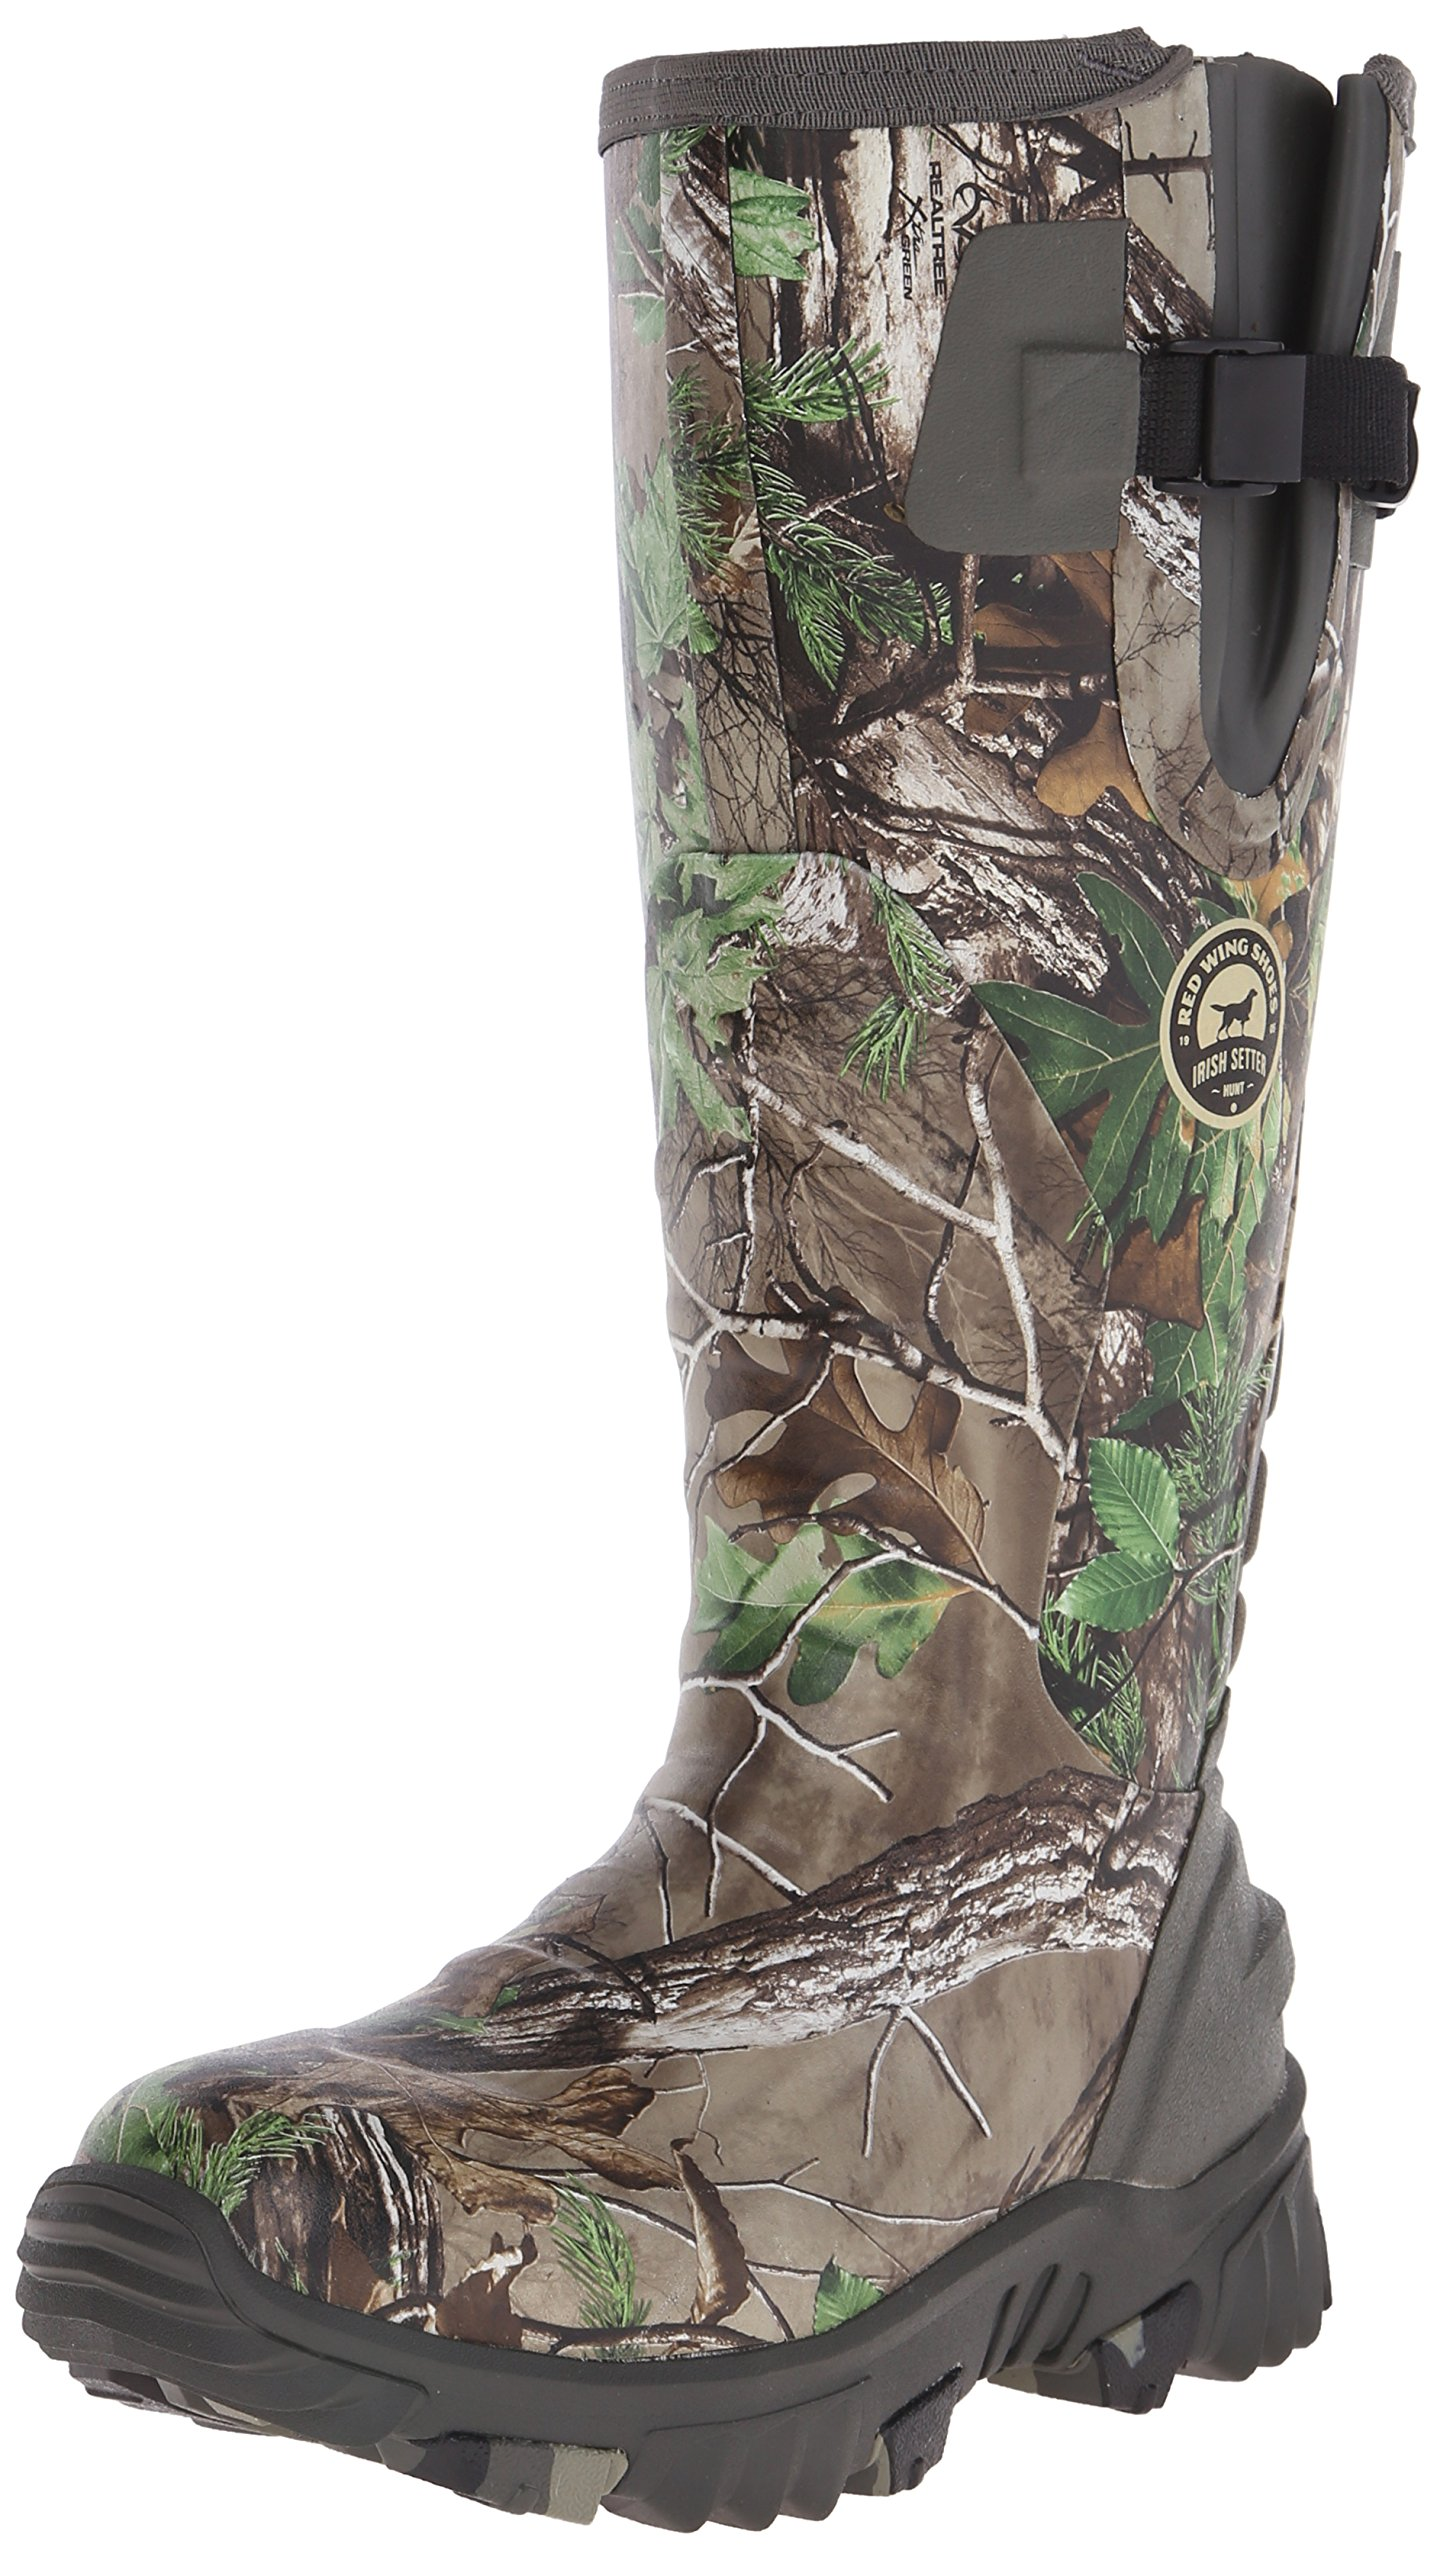 Irish Setter Women's 4885 Rutmaster 2.0 15'' Uninsulated Rubber Hunting Boot, Real Tree Camo, 8 E US